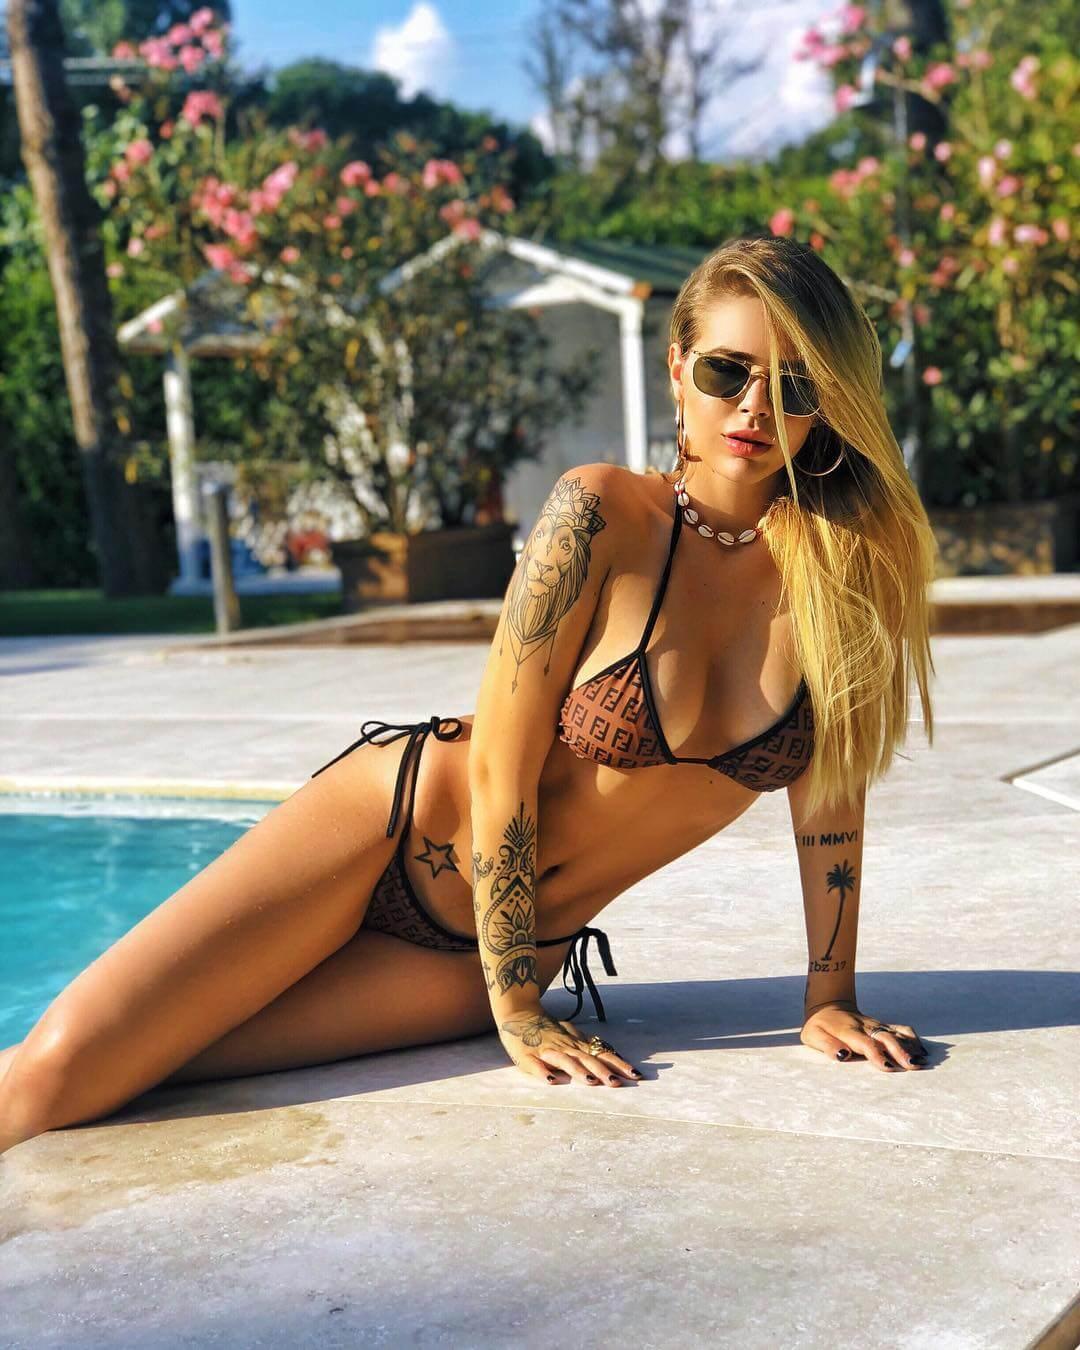 Ginevra Lambruschi hot bikini pics